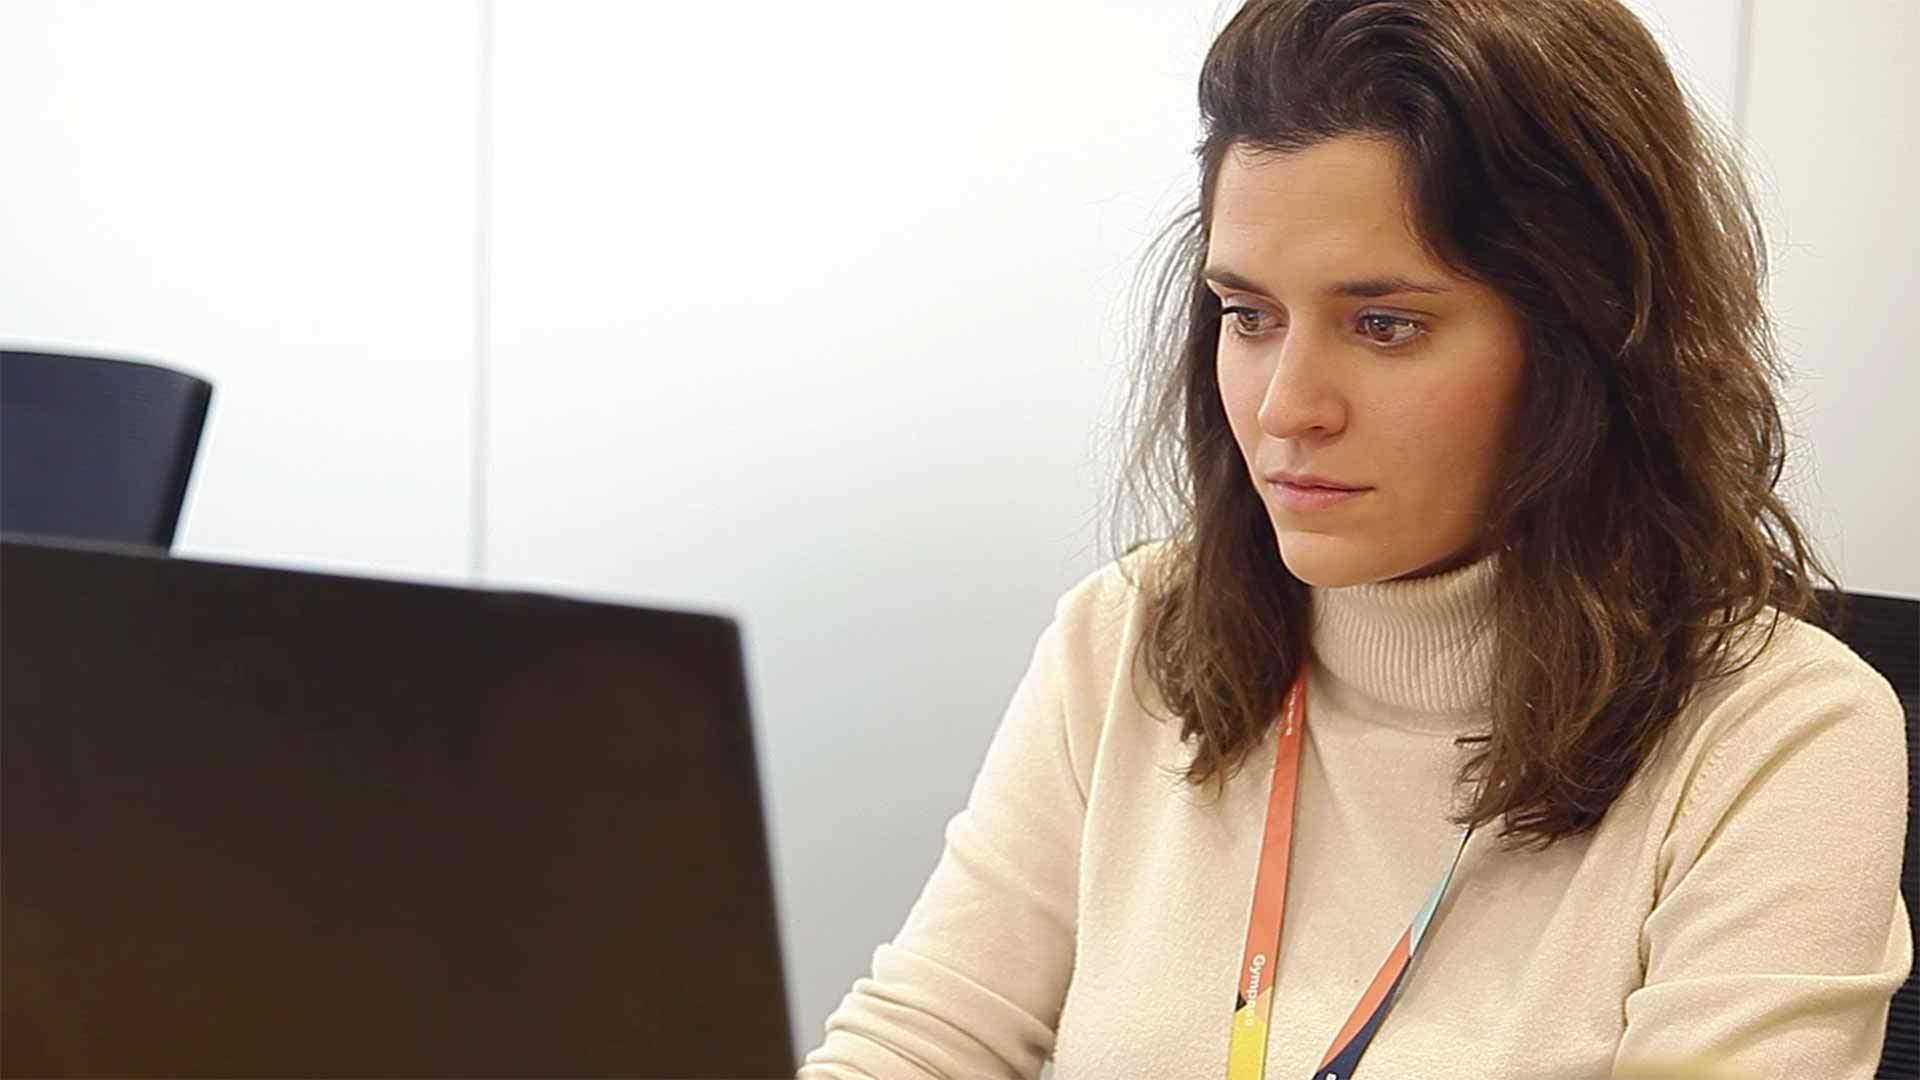 master en comunicacion multimedia internet alumna ordenador